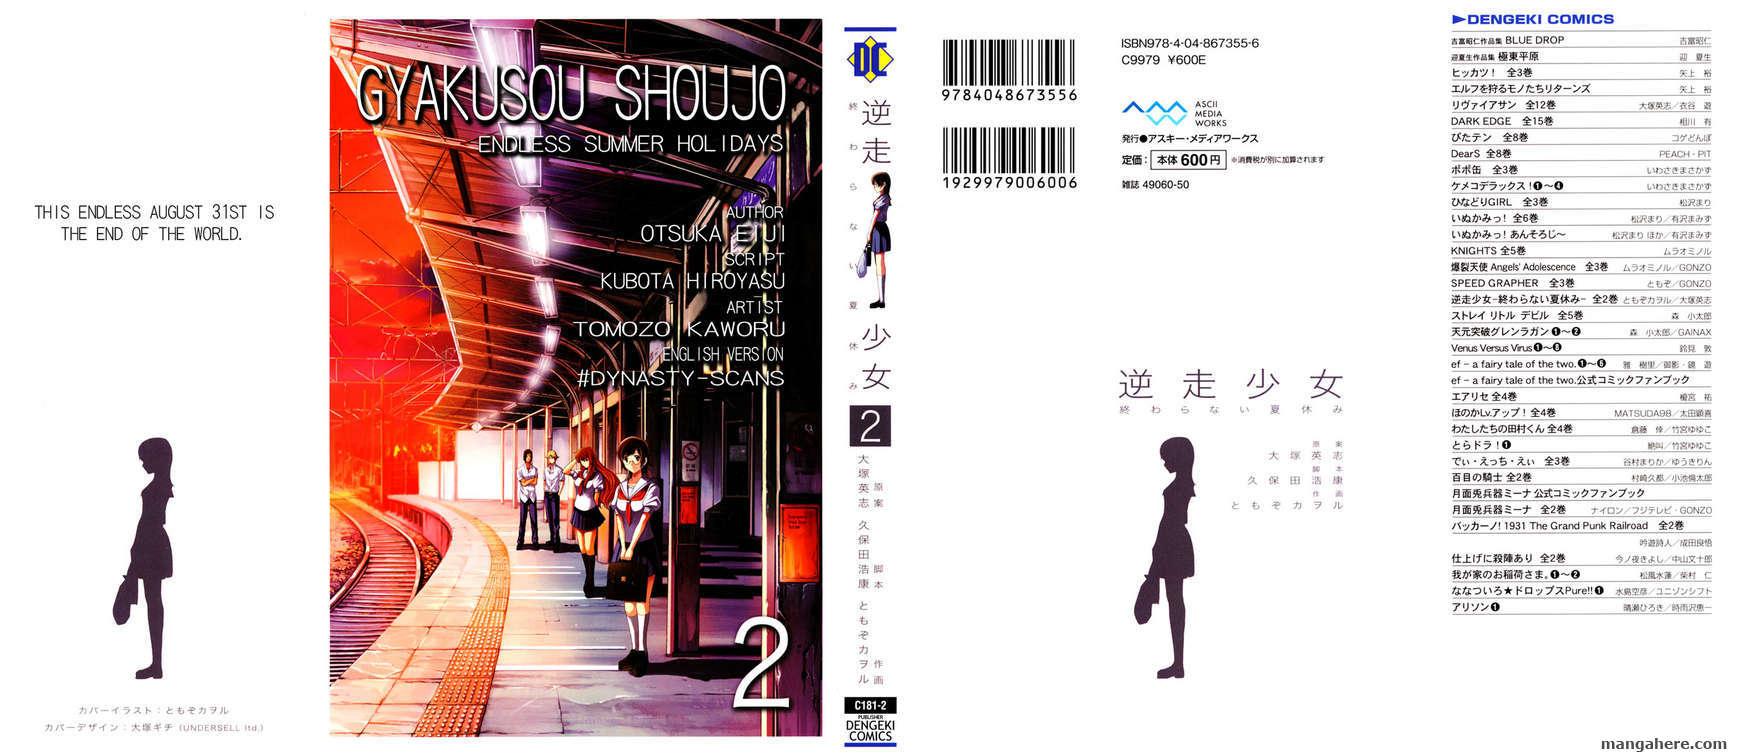 Gyakusou Shoujo 6 Page 2